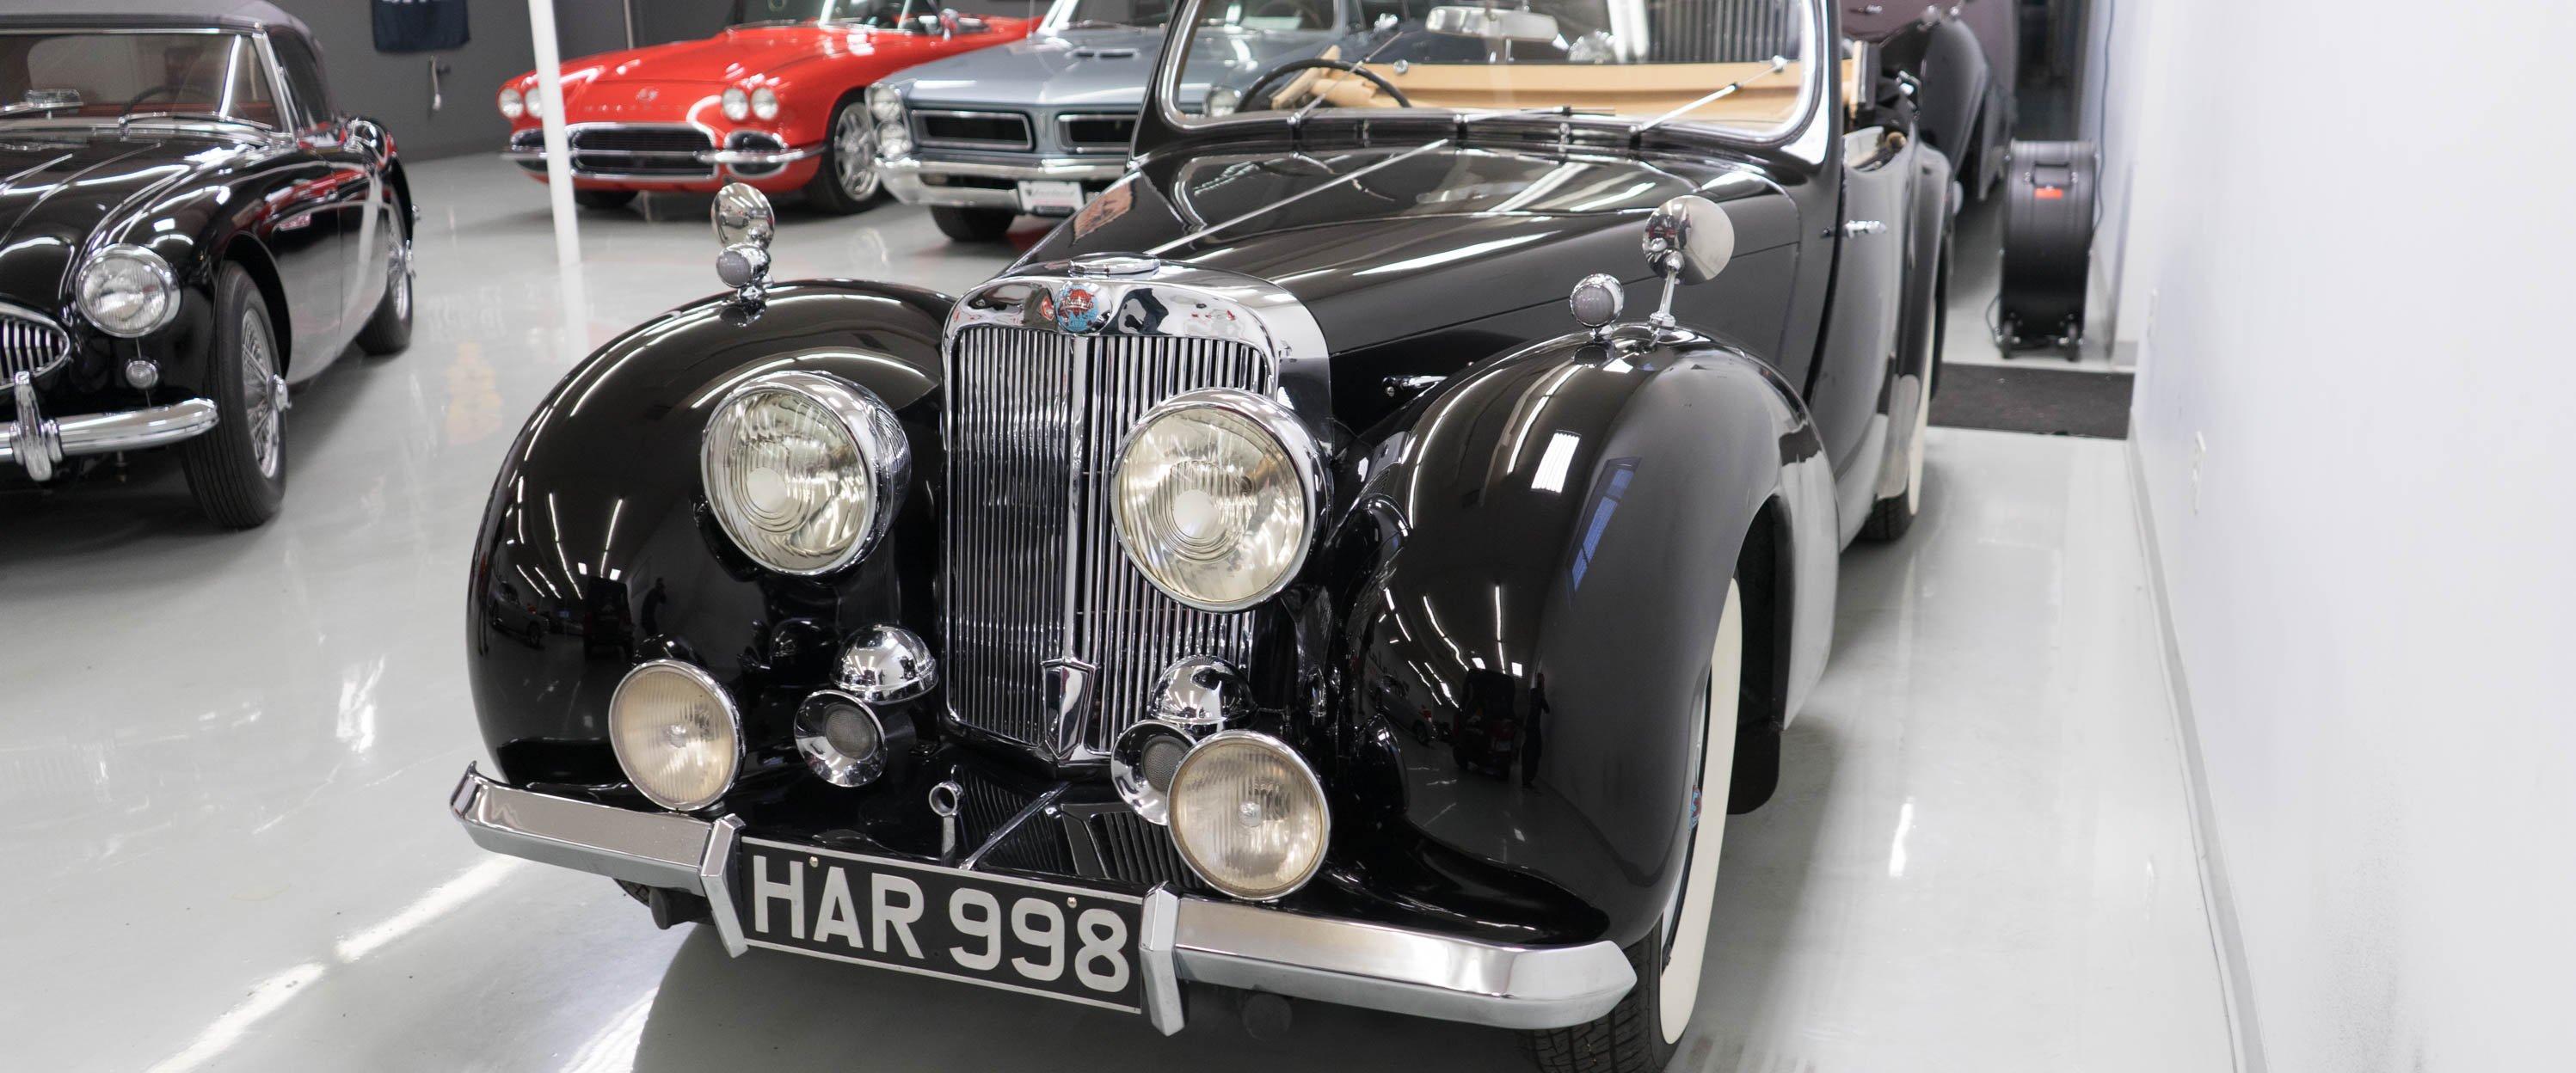 1946-Triumph-1800-Roadster-Black-slideshow-003@2x